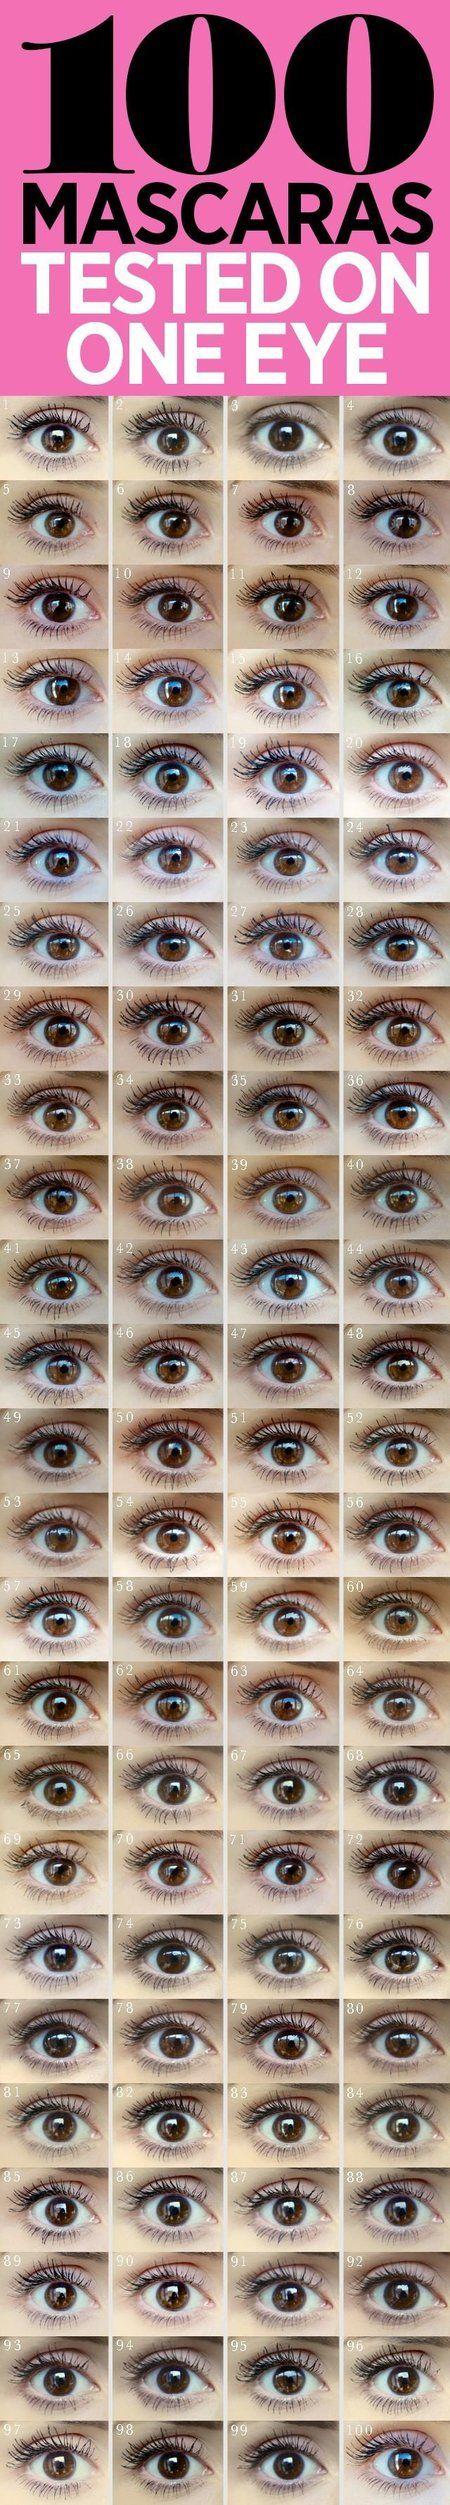 100 mascaras tested on ONE eye: picture reviews - #mascara #mascarareview #mascaratip #cosmopolitan